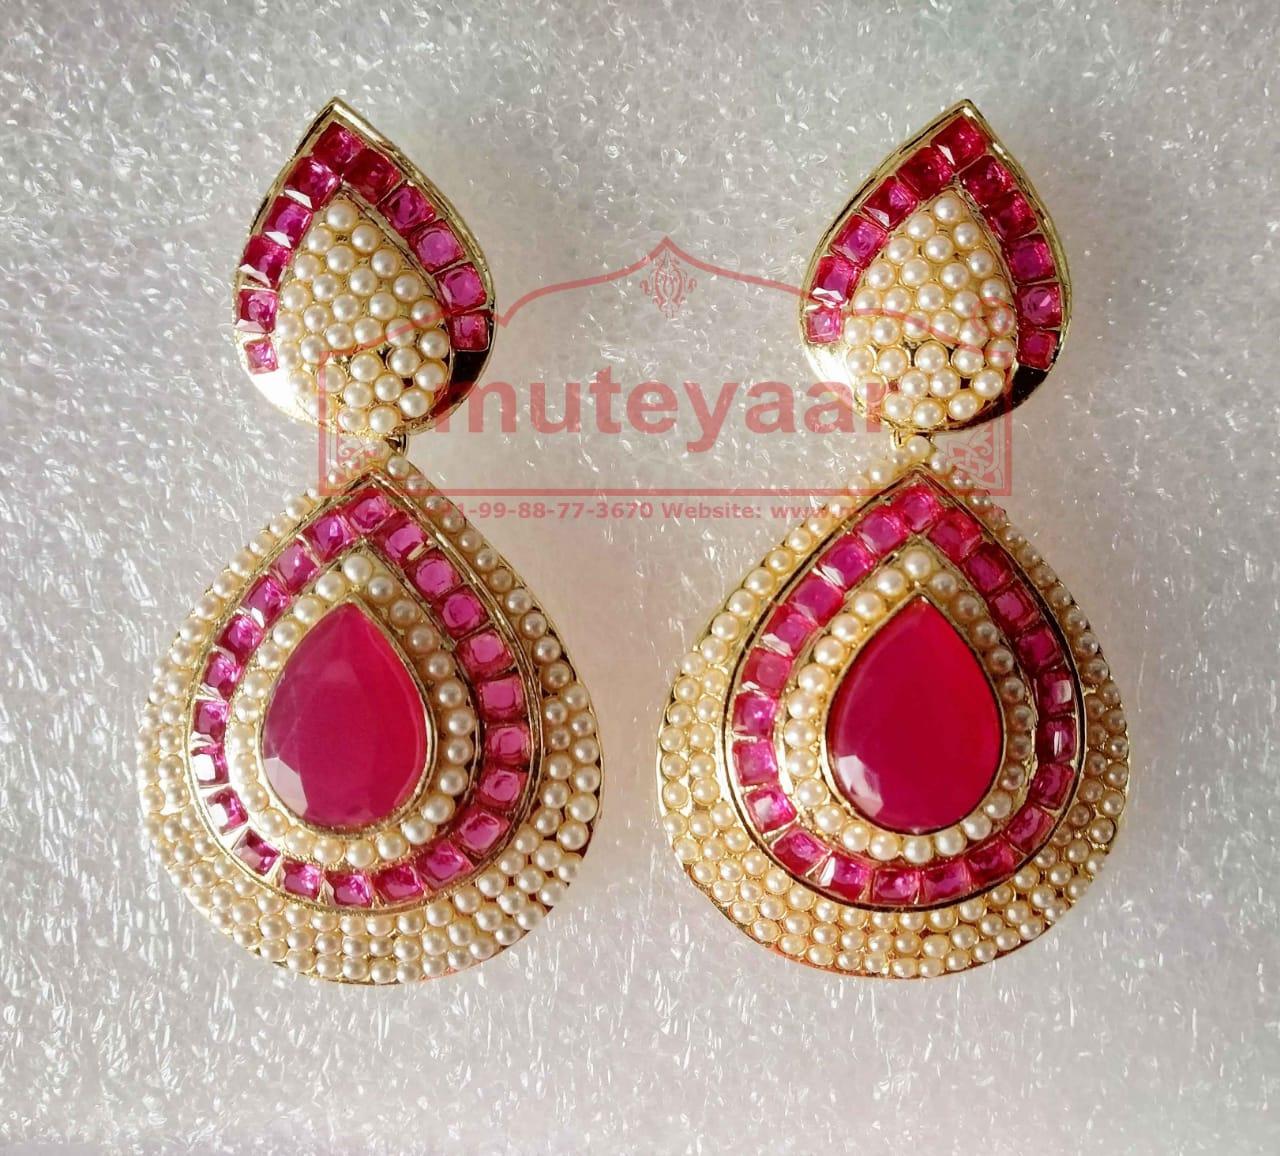 Jadau Work Gold Polished Traditional Punjabi Earrings J0438 1